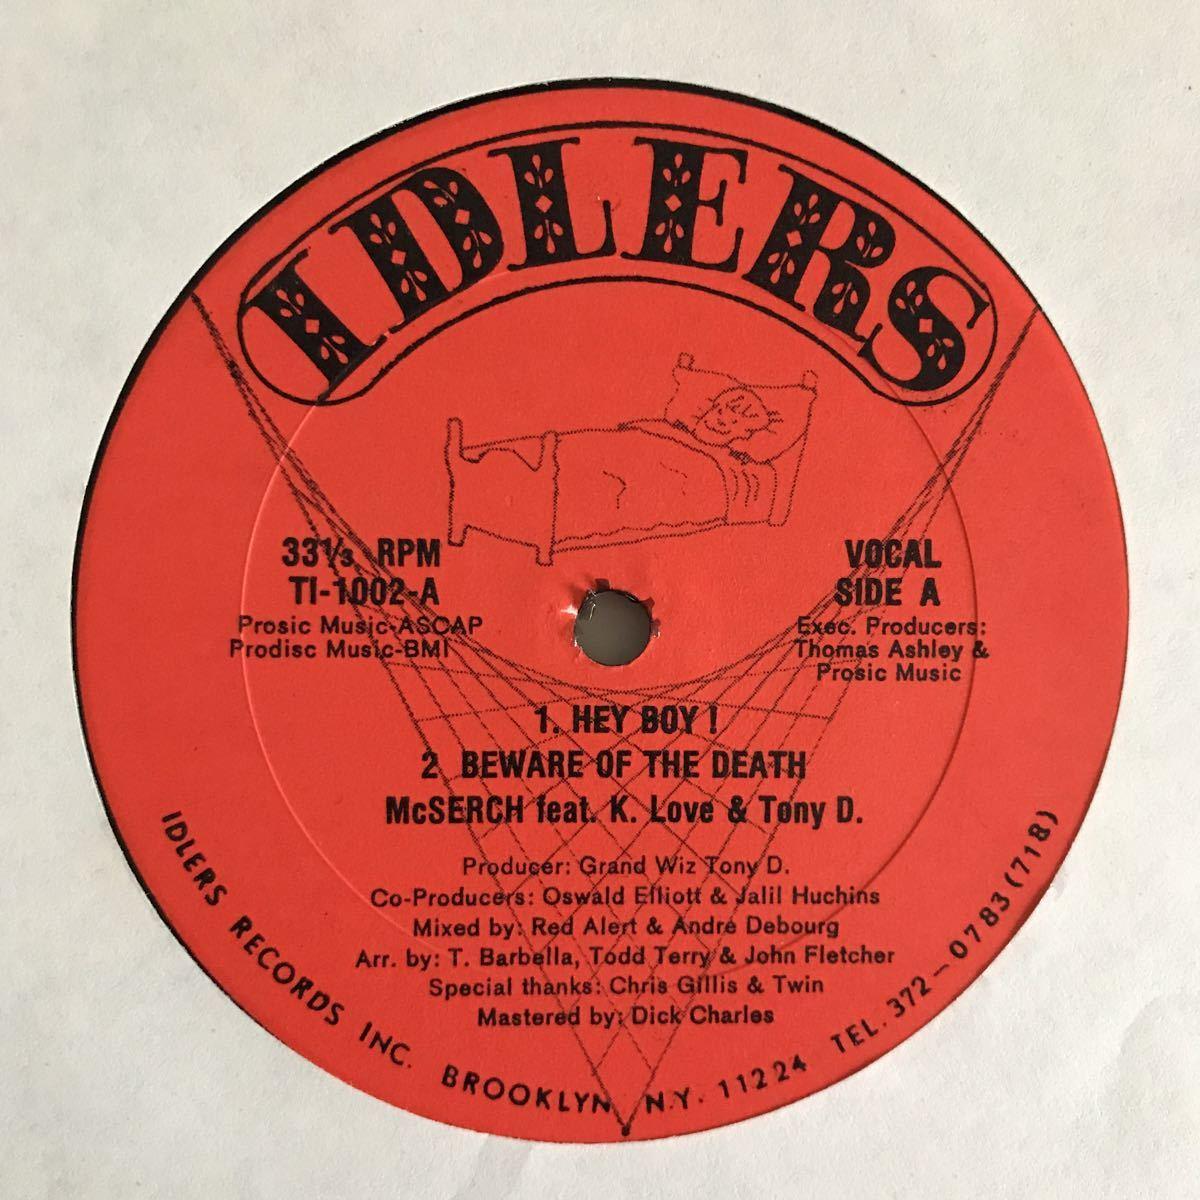 MC Serch Feat. K. Love & Tony D. - Hey Boy! / Beware Of The Death【US Orig.】【オリジナル】【Funkadelic/Brass Constructionネタ】_画像1